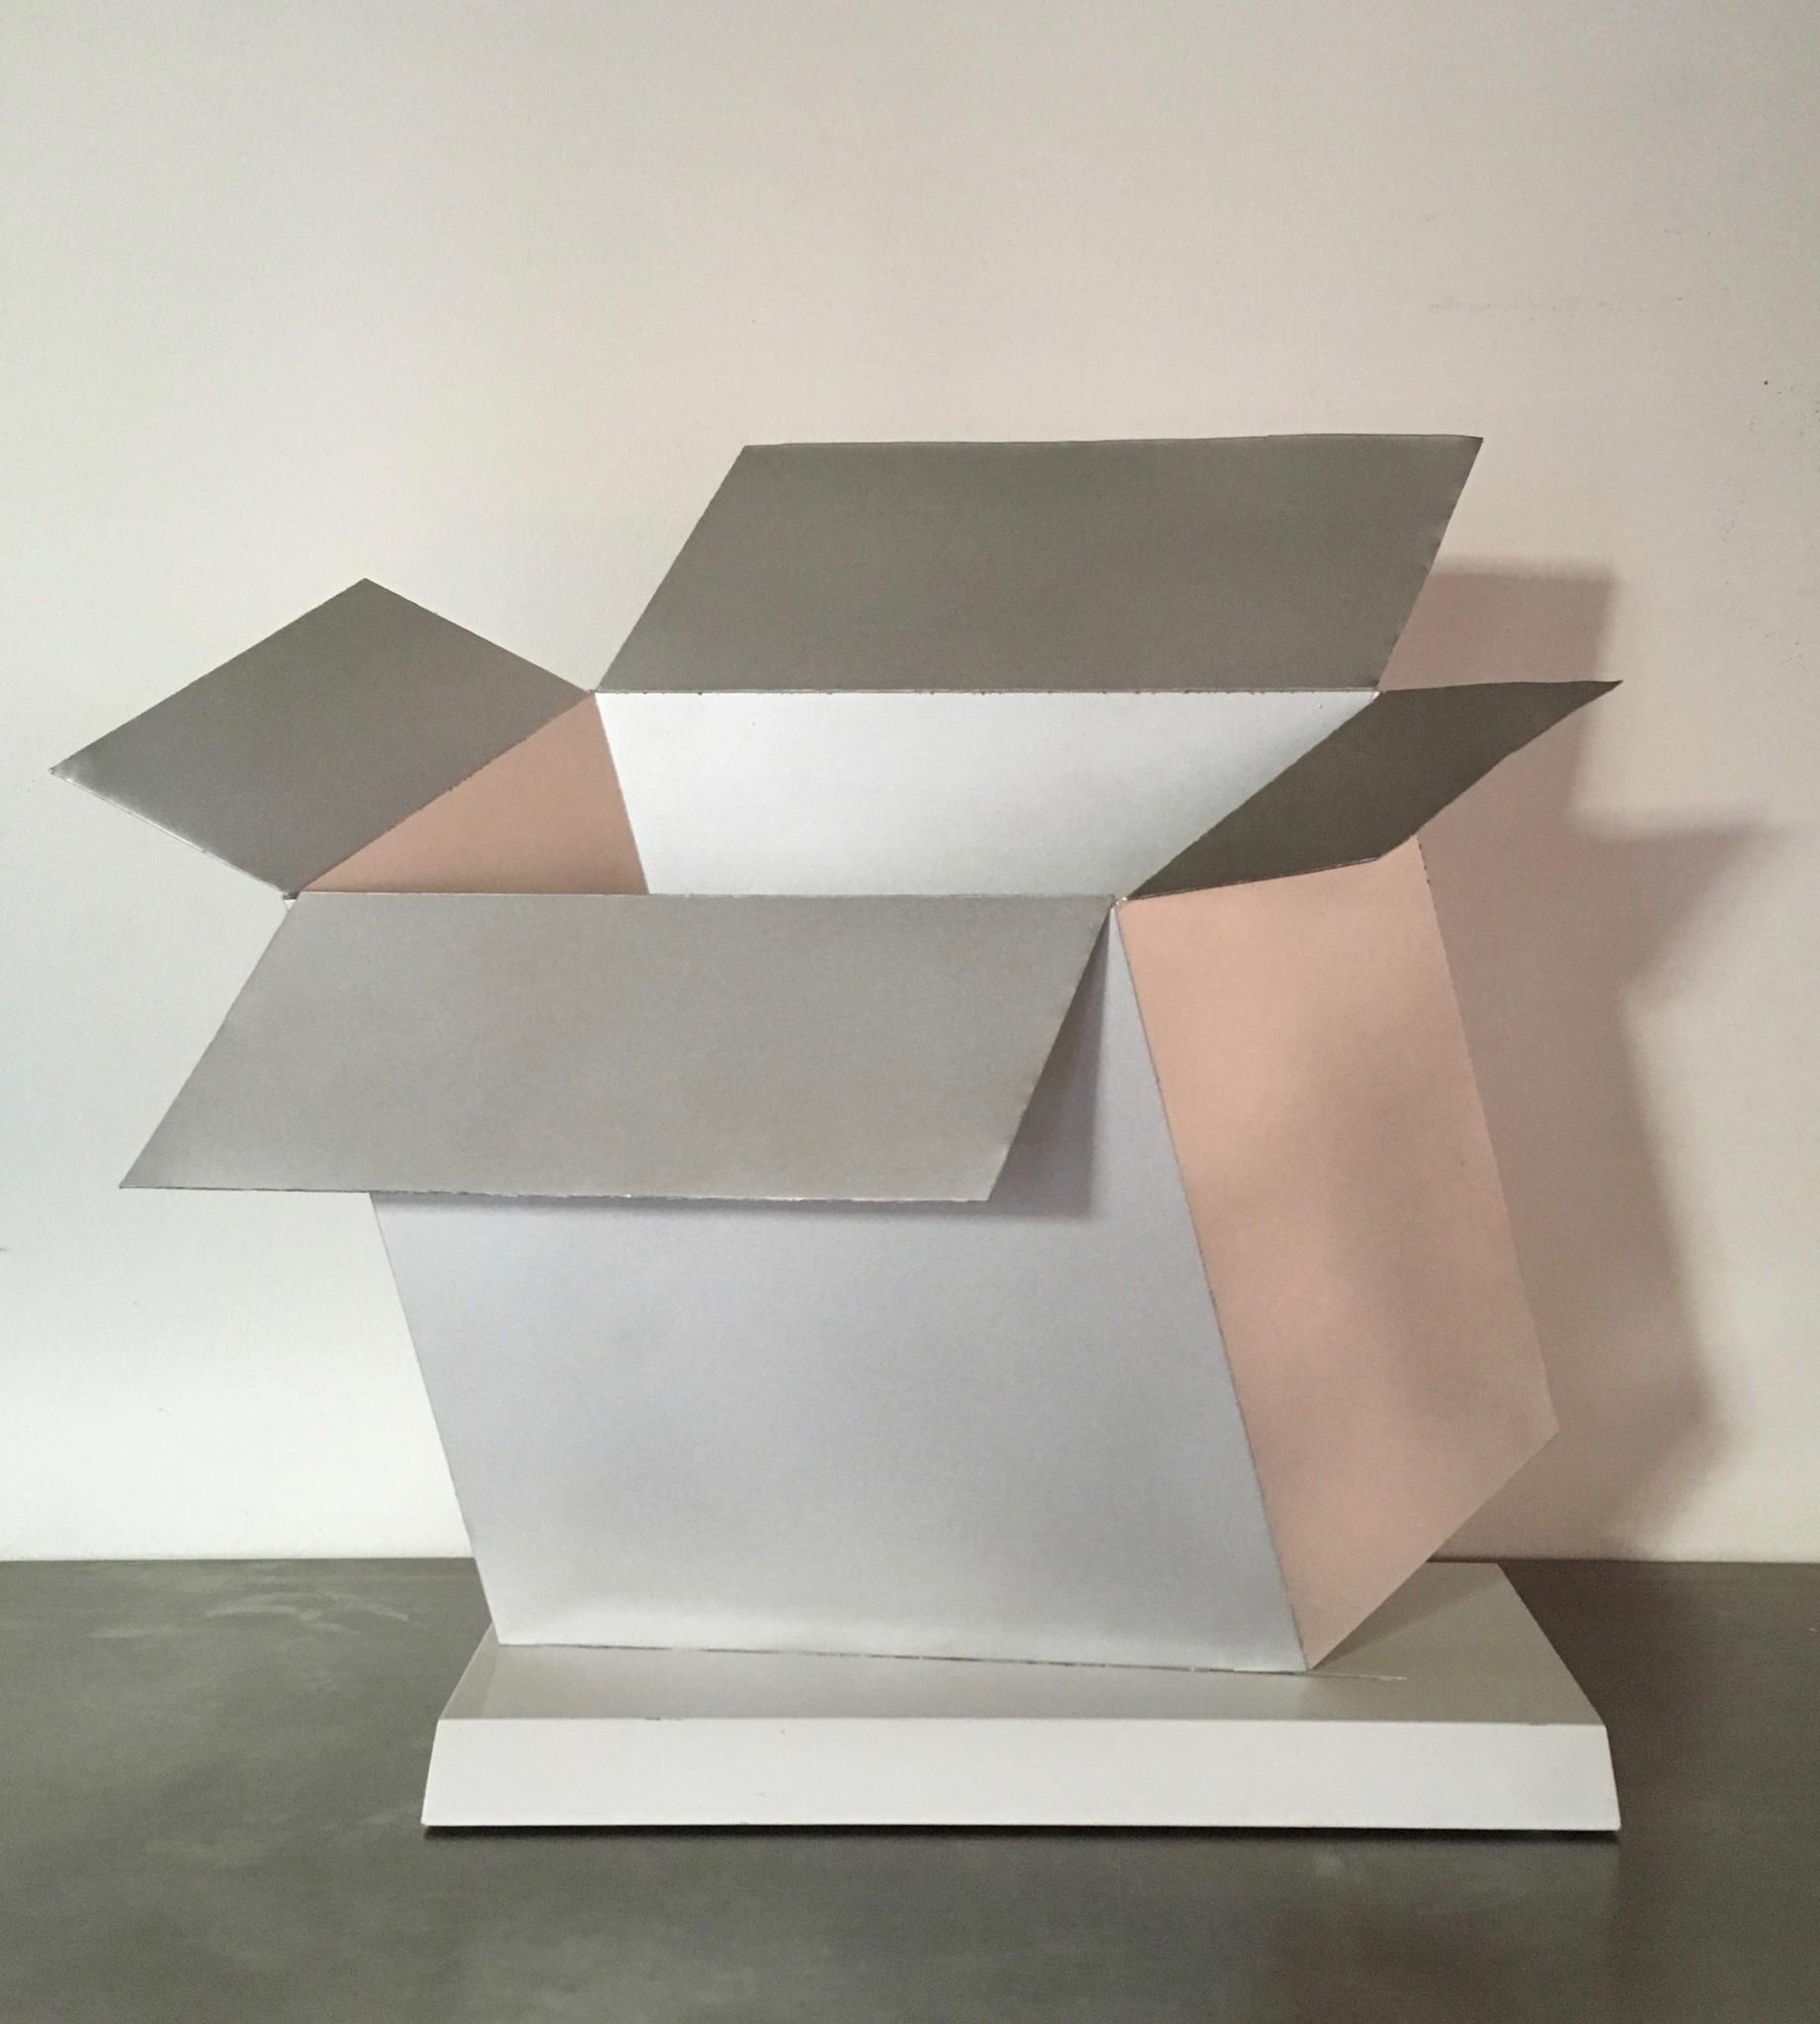 J. HENNEMAN | BOX, 2004